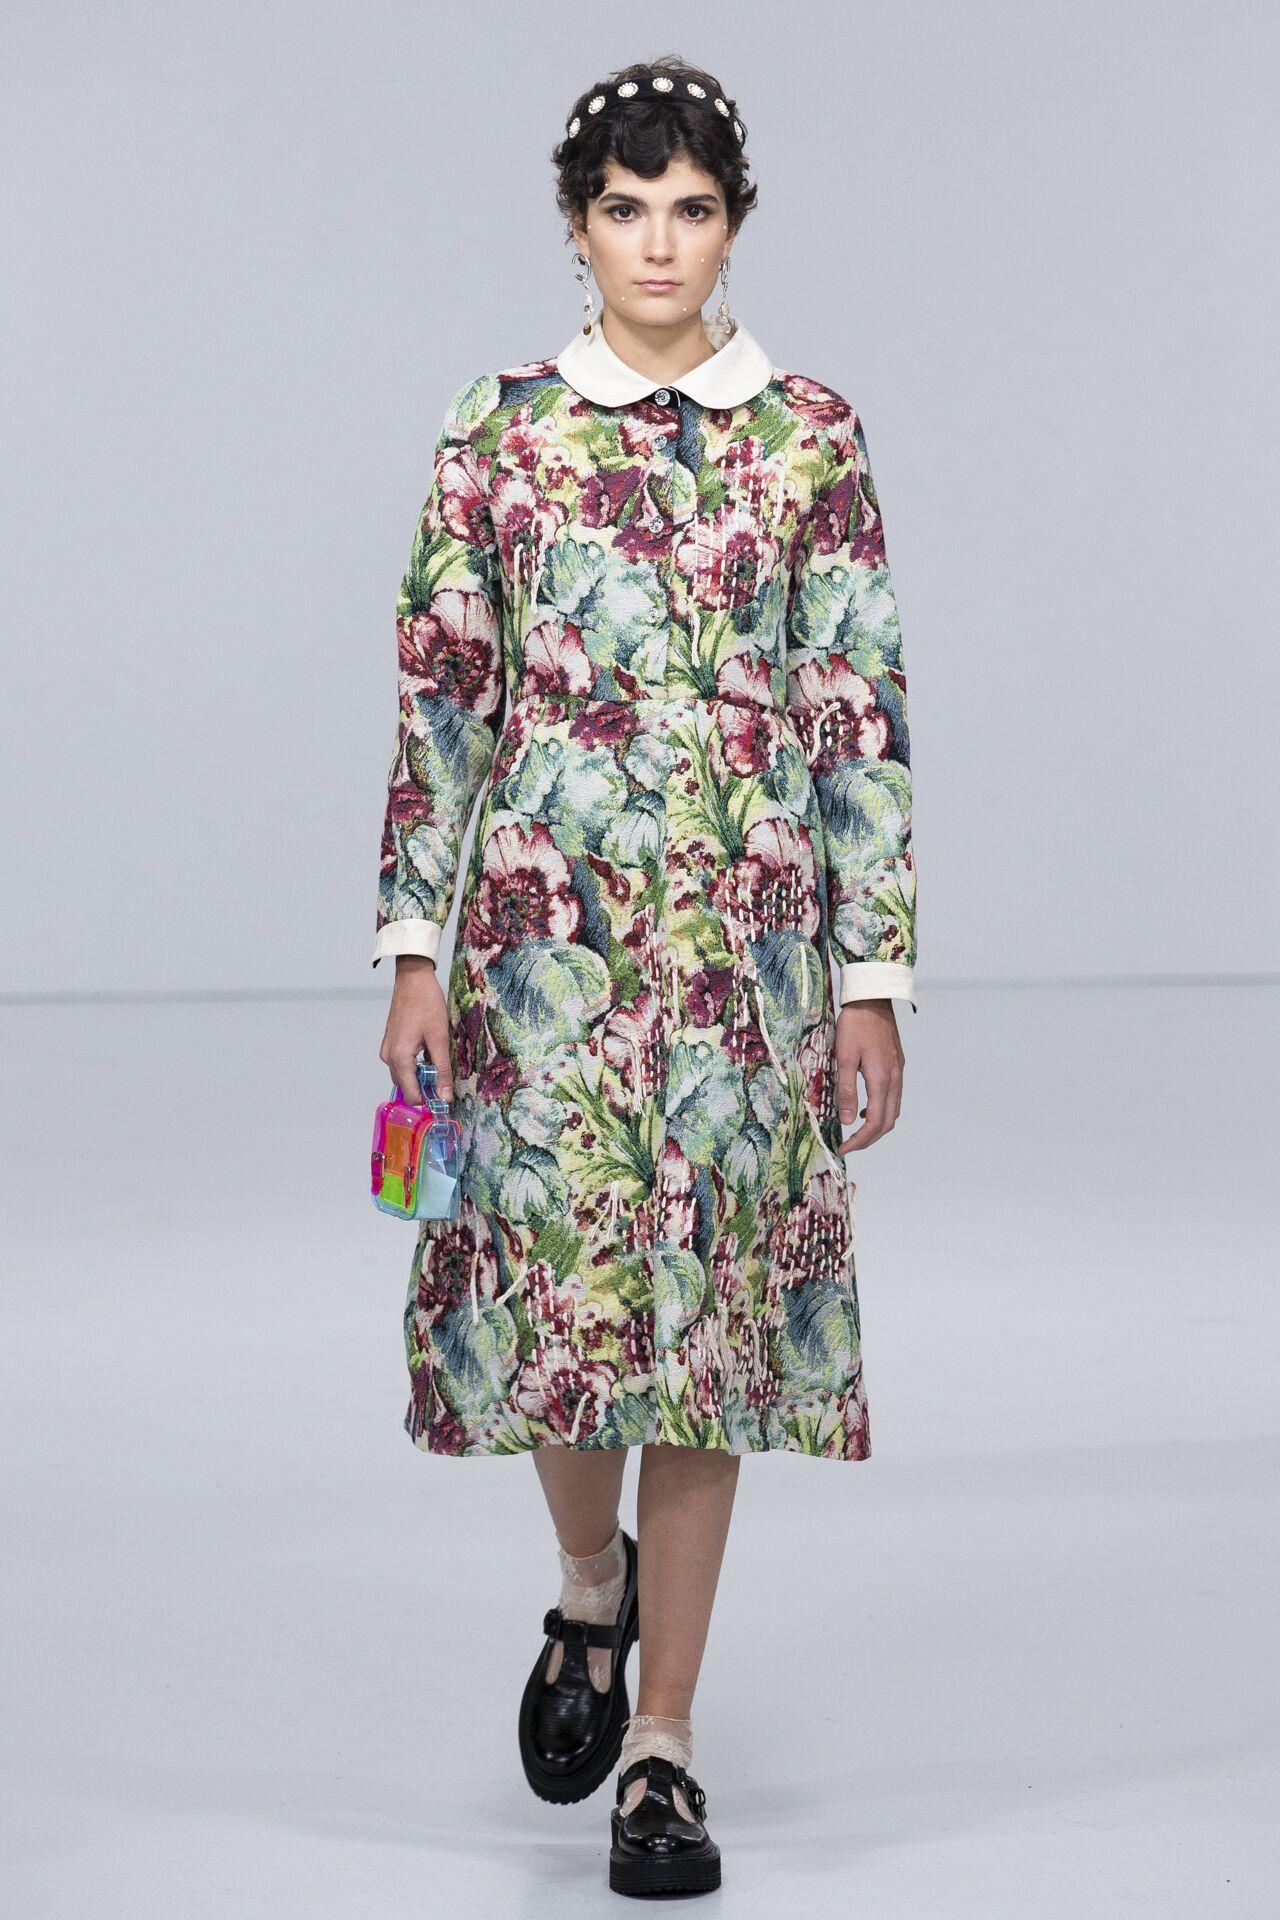 Refuse club post aw 20 london fashion week feature! (7)